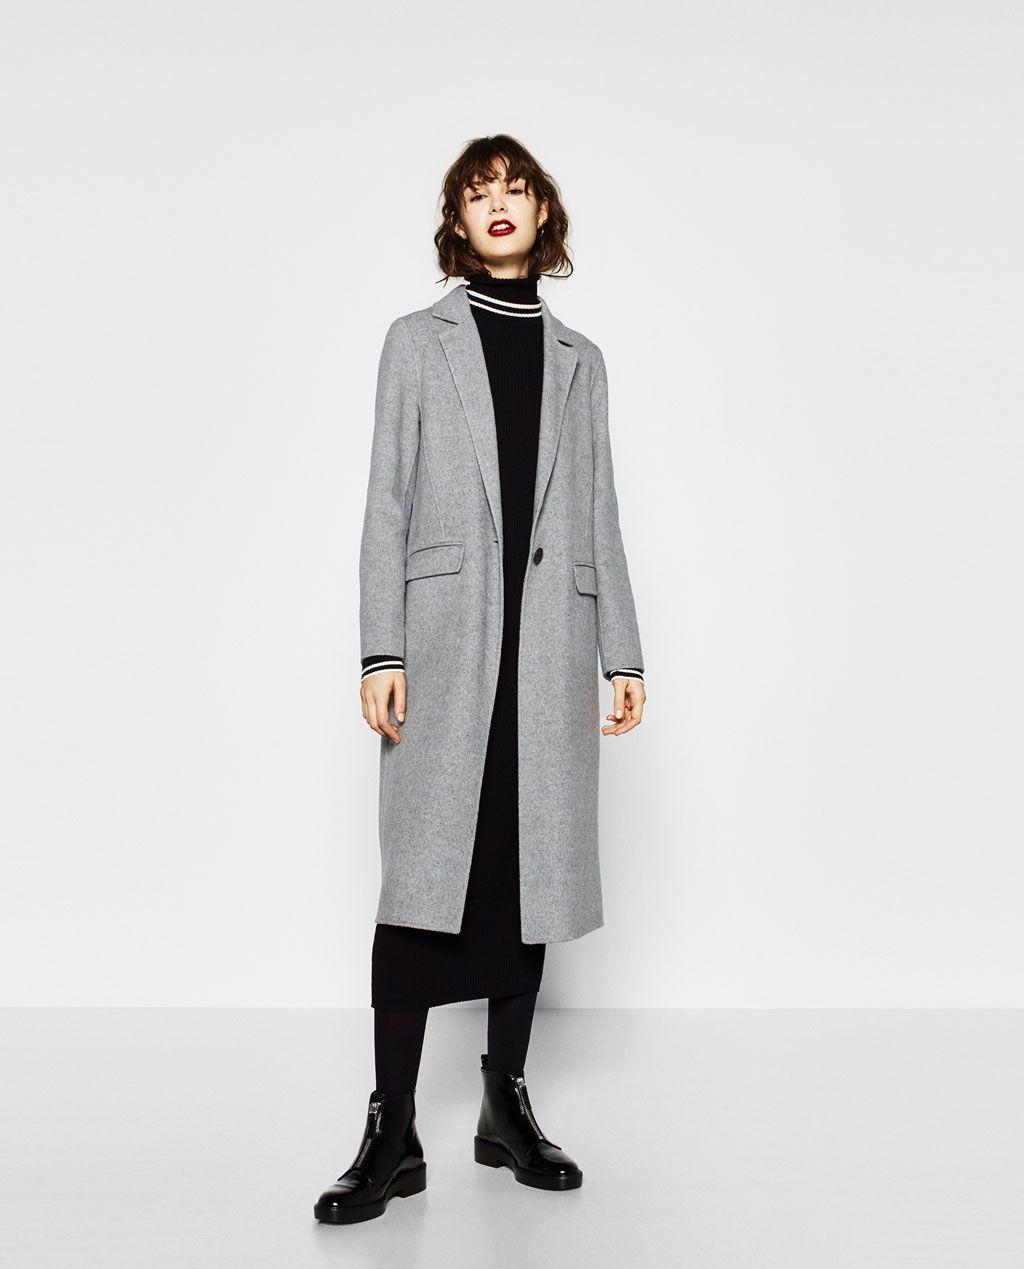 Largo Y Abrigos España Zara Abrigo Mujer Rebajas RPx6qdYxw8